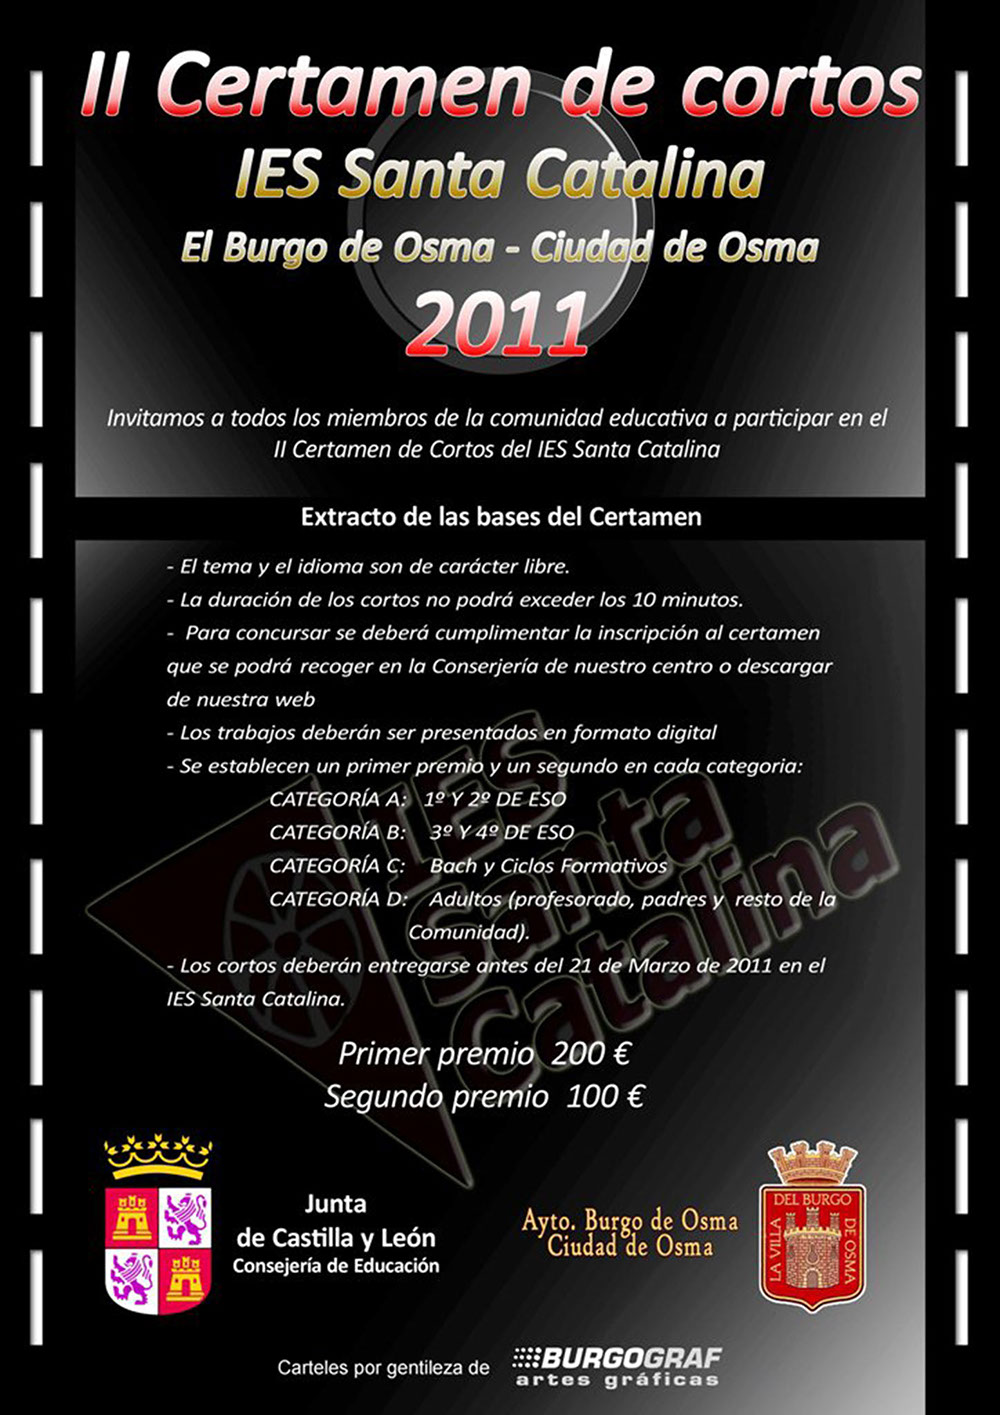 Cartel II Certamen de Cortos 2011